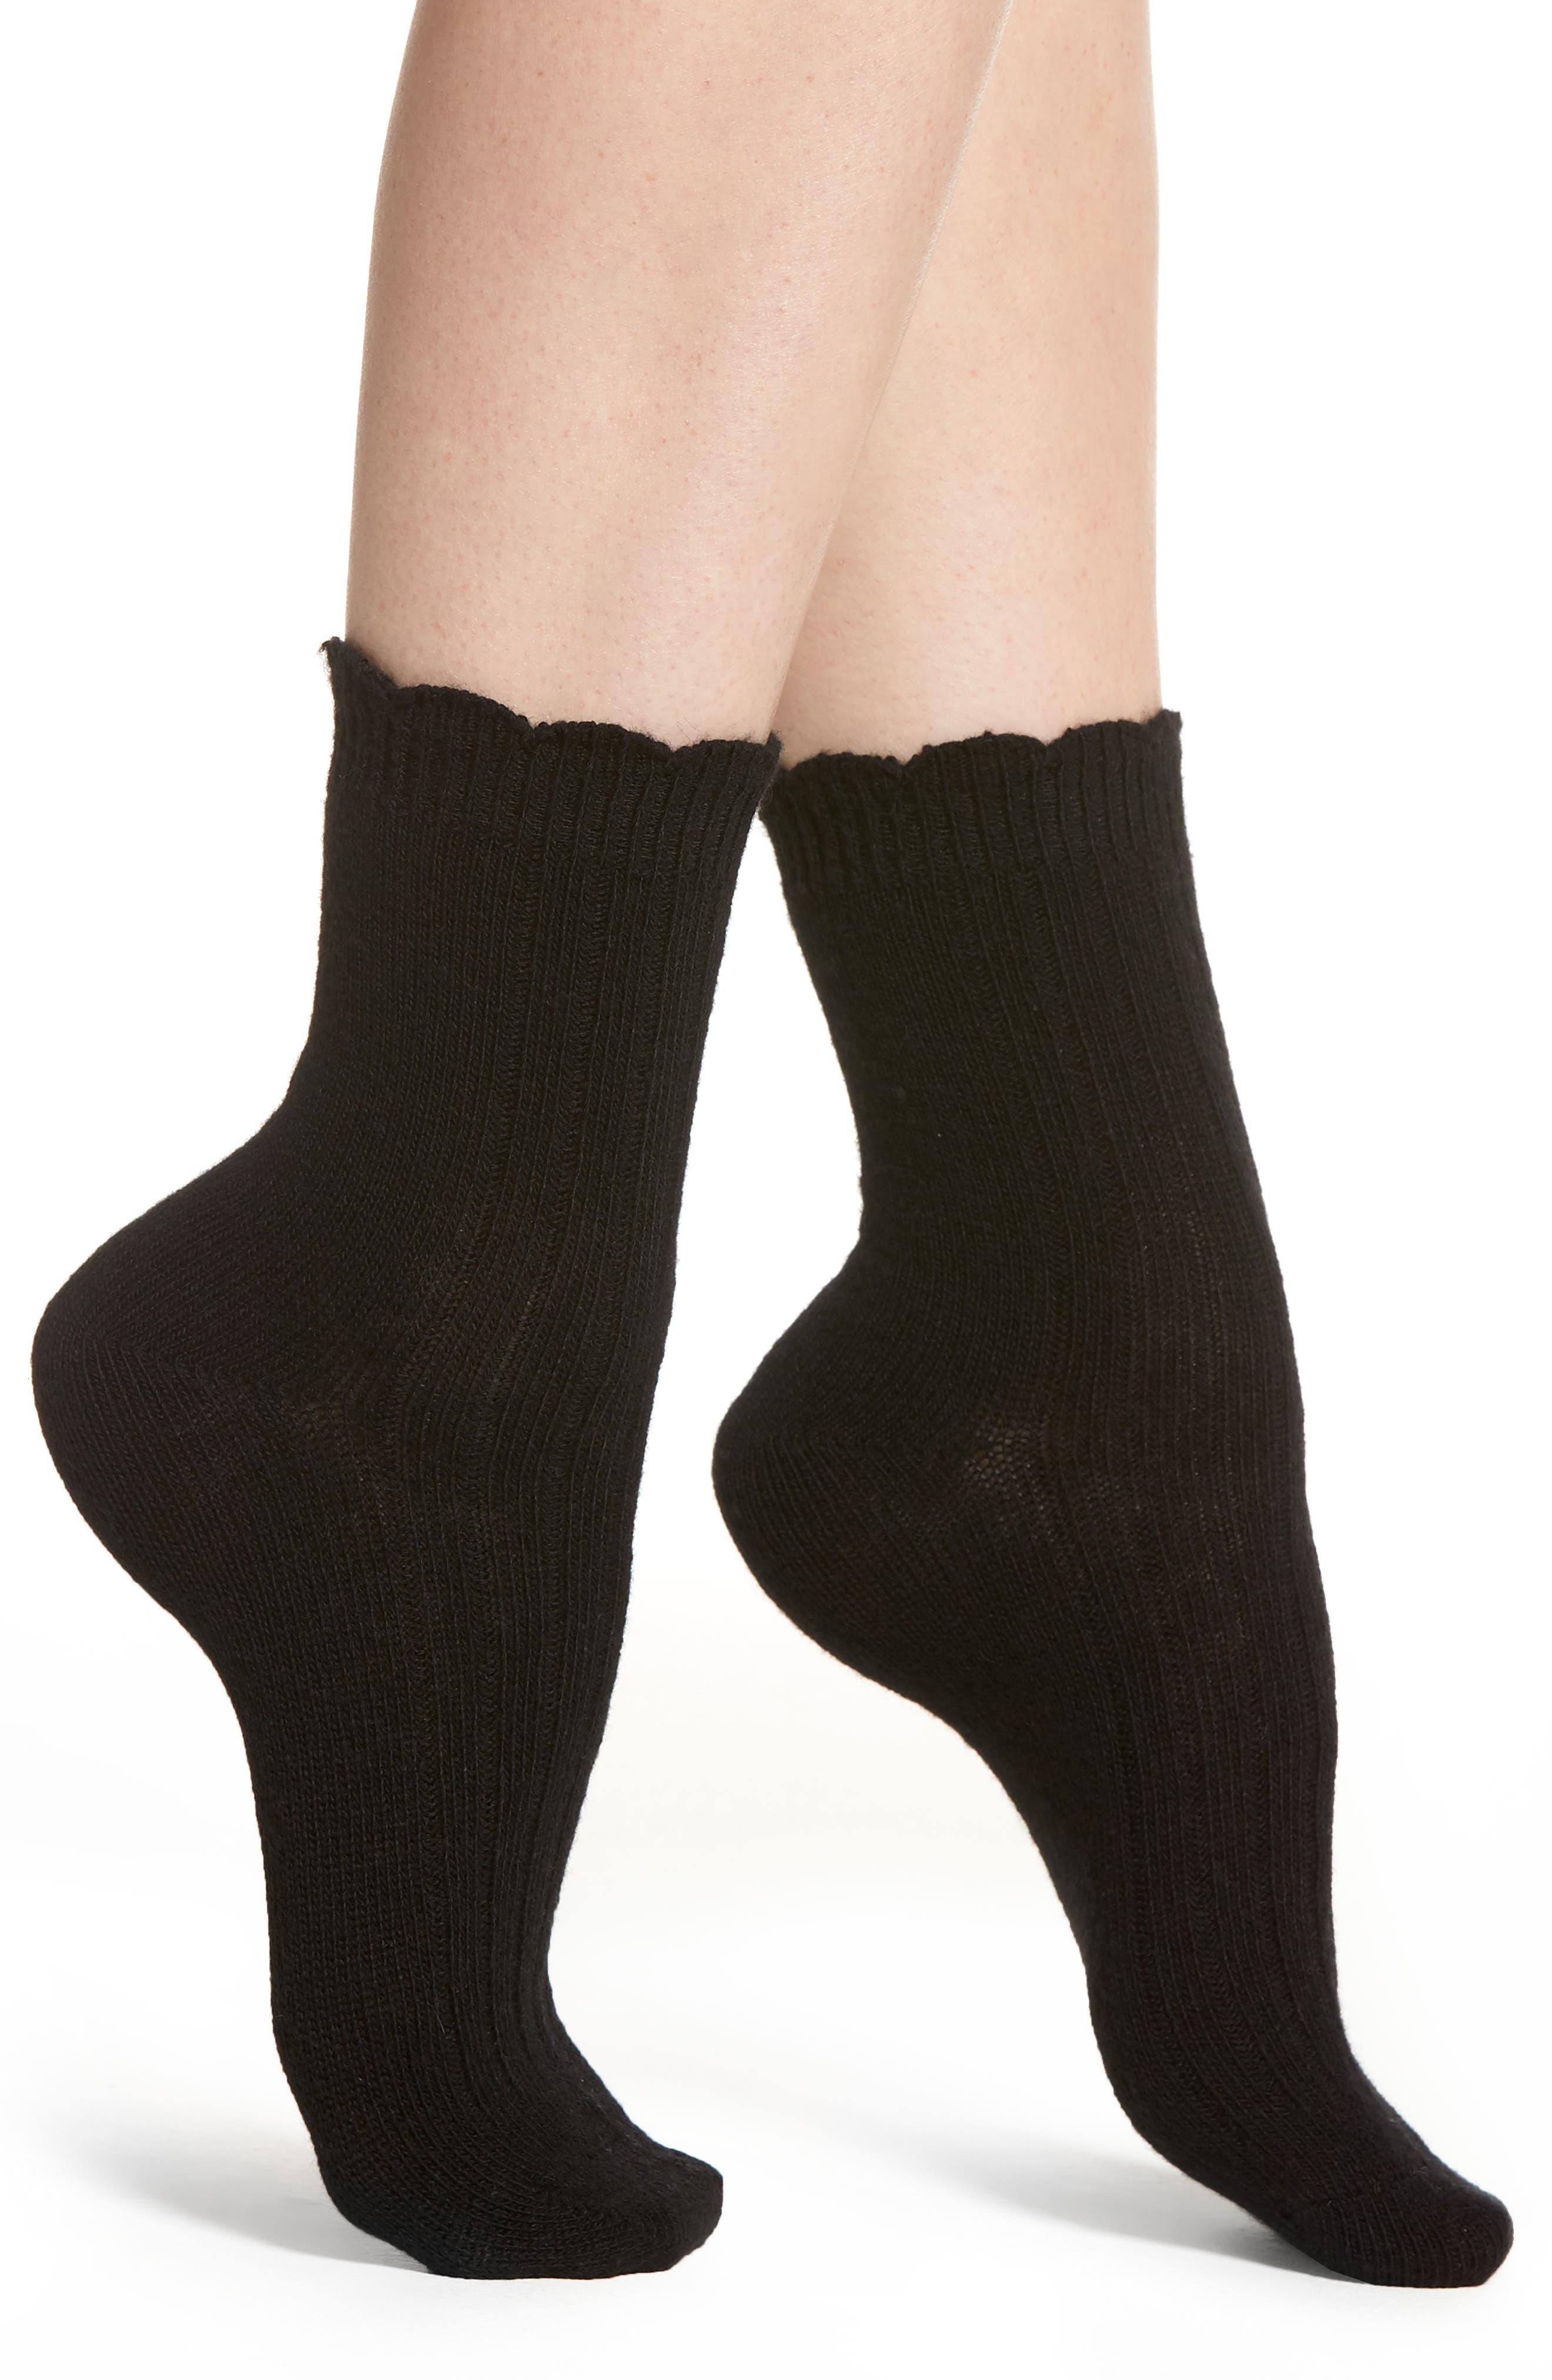 UGG<SUP>®</SUP>, Nayomi Socks, Main thumbnail 1, color, 001